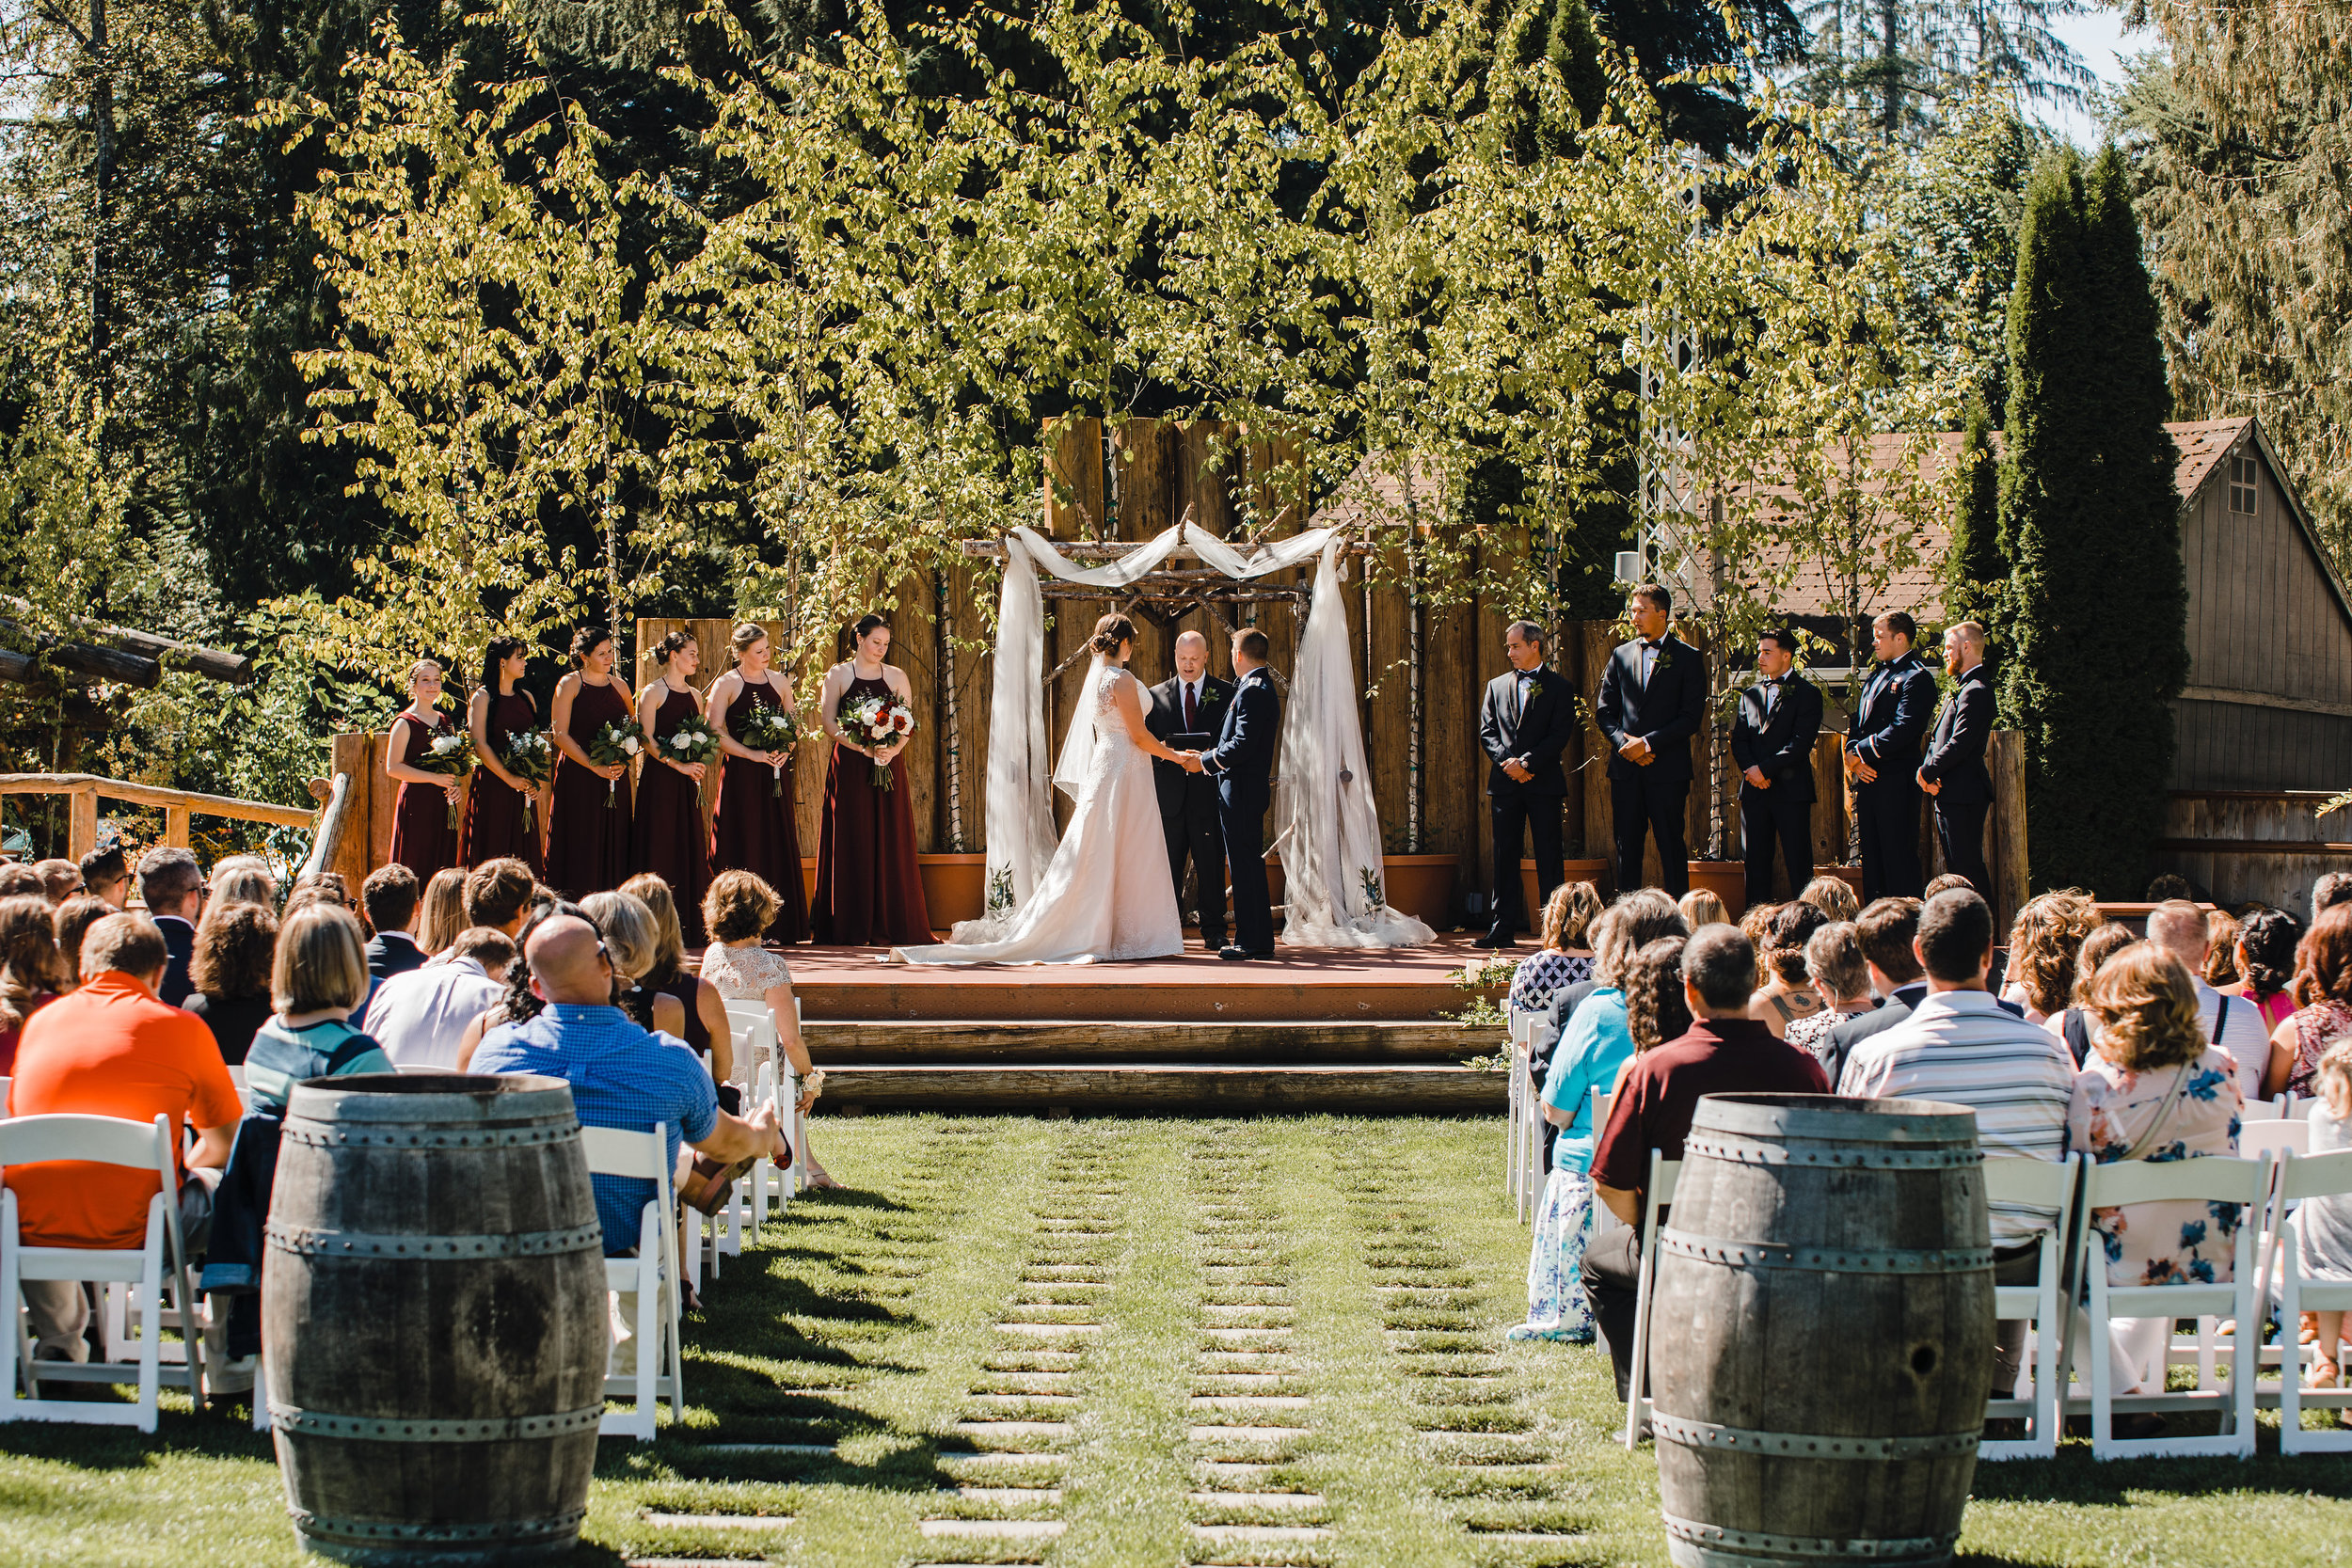 olympia washington wedding photographer outdoor wedding organza wedding arch grass stones isle